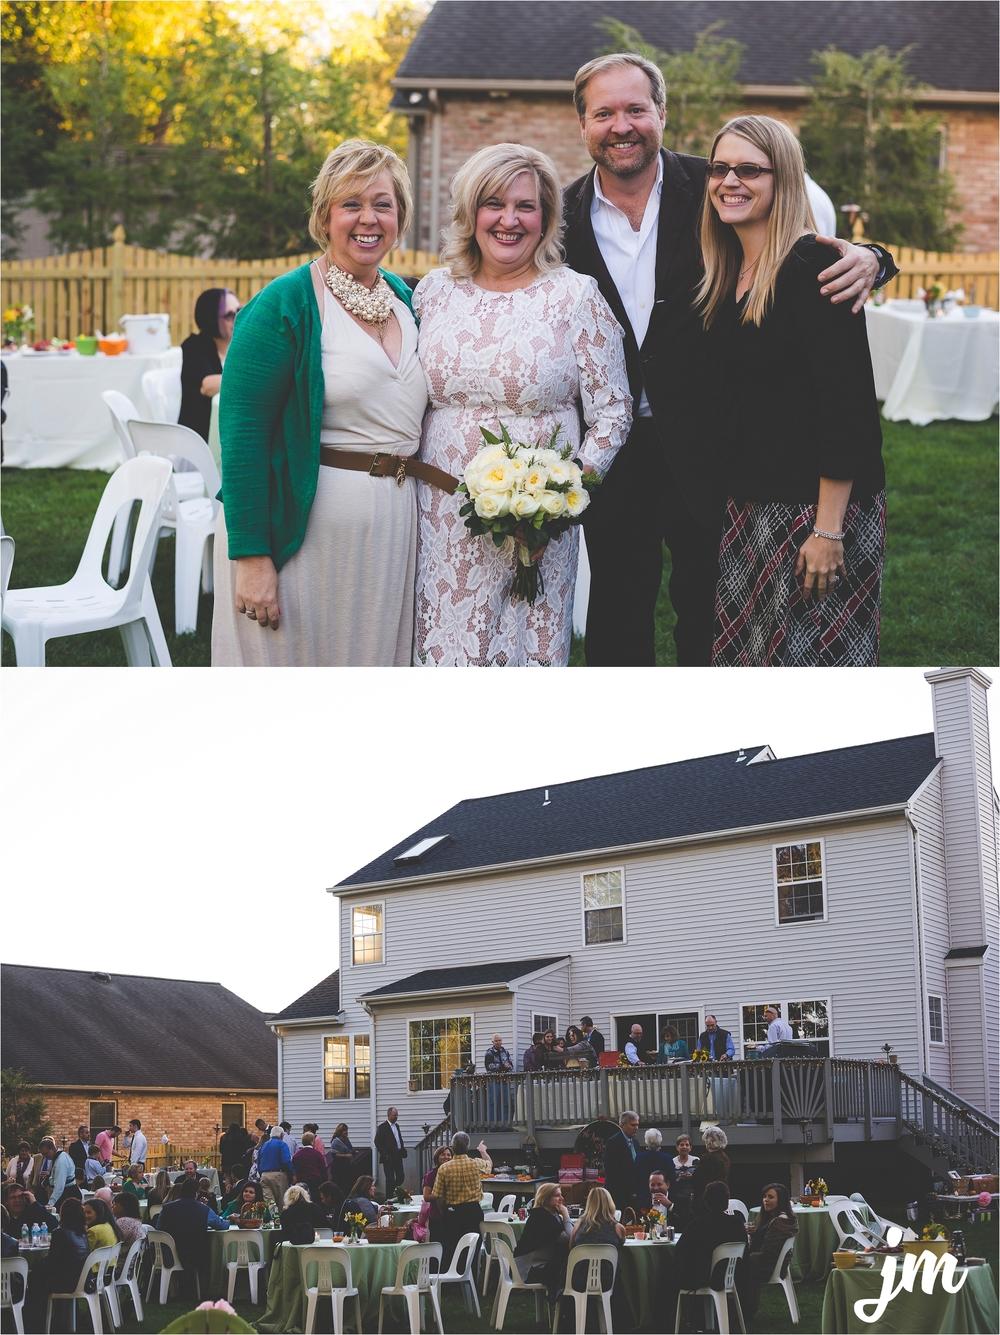 backyard-wedding-pacific-northwest-photographer-jannicka-mayte_0030.jpg